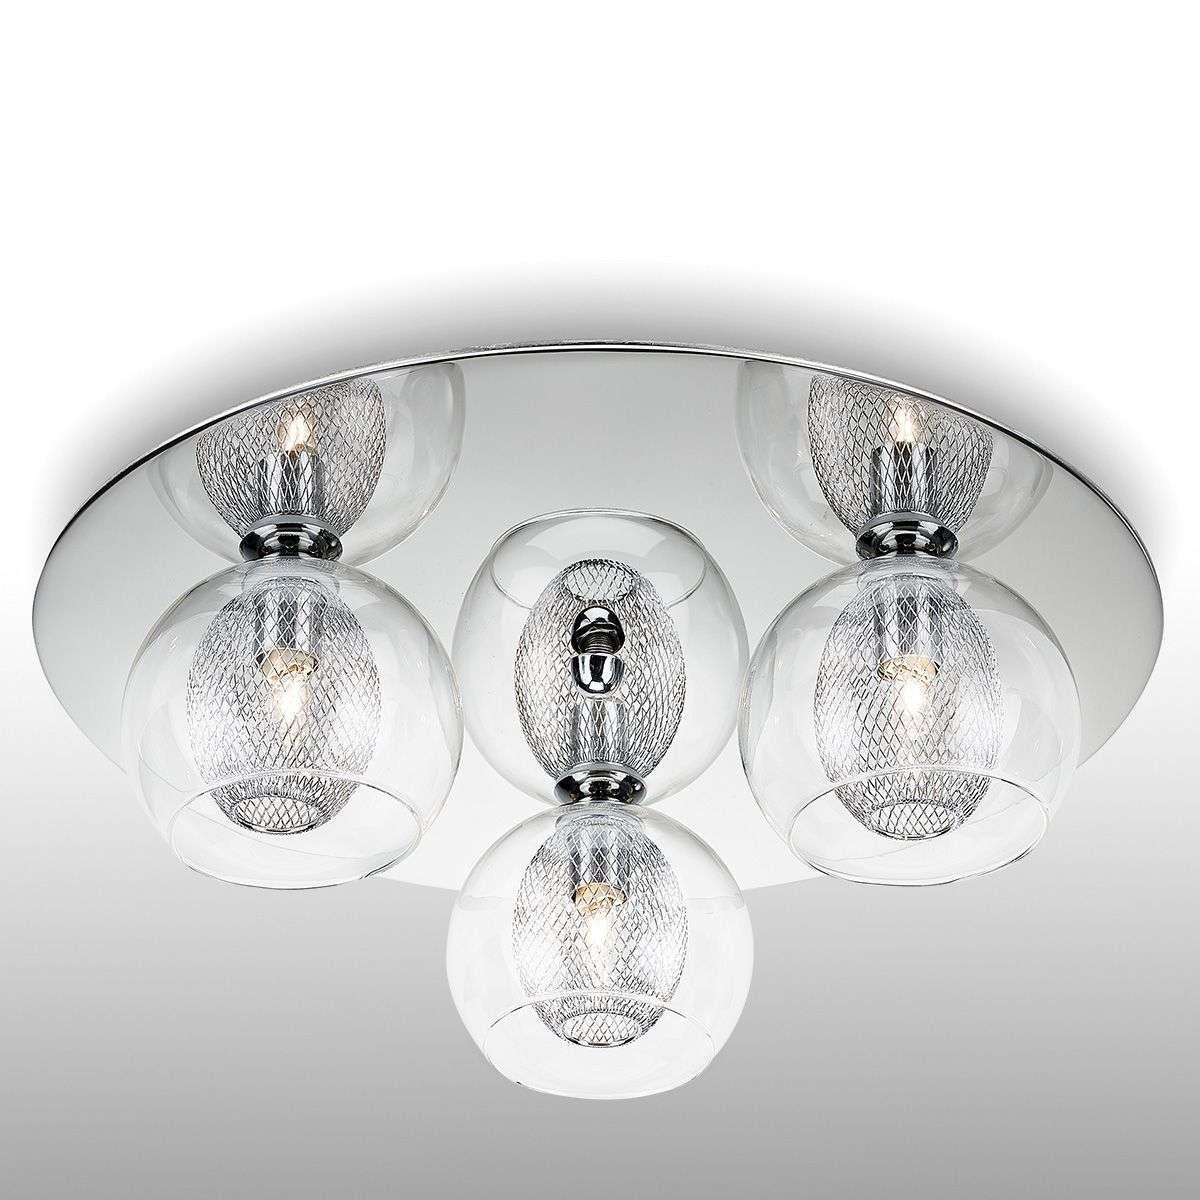 Three Bulb Coda Ceiling Light 7531694 31